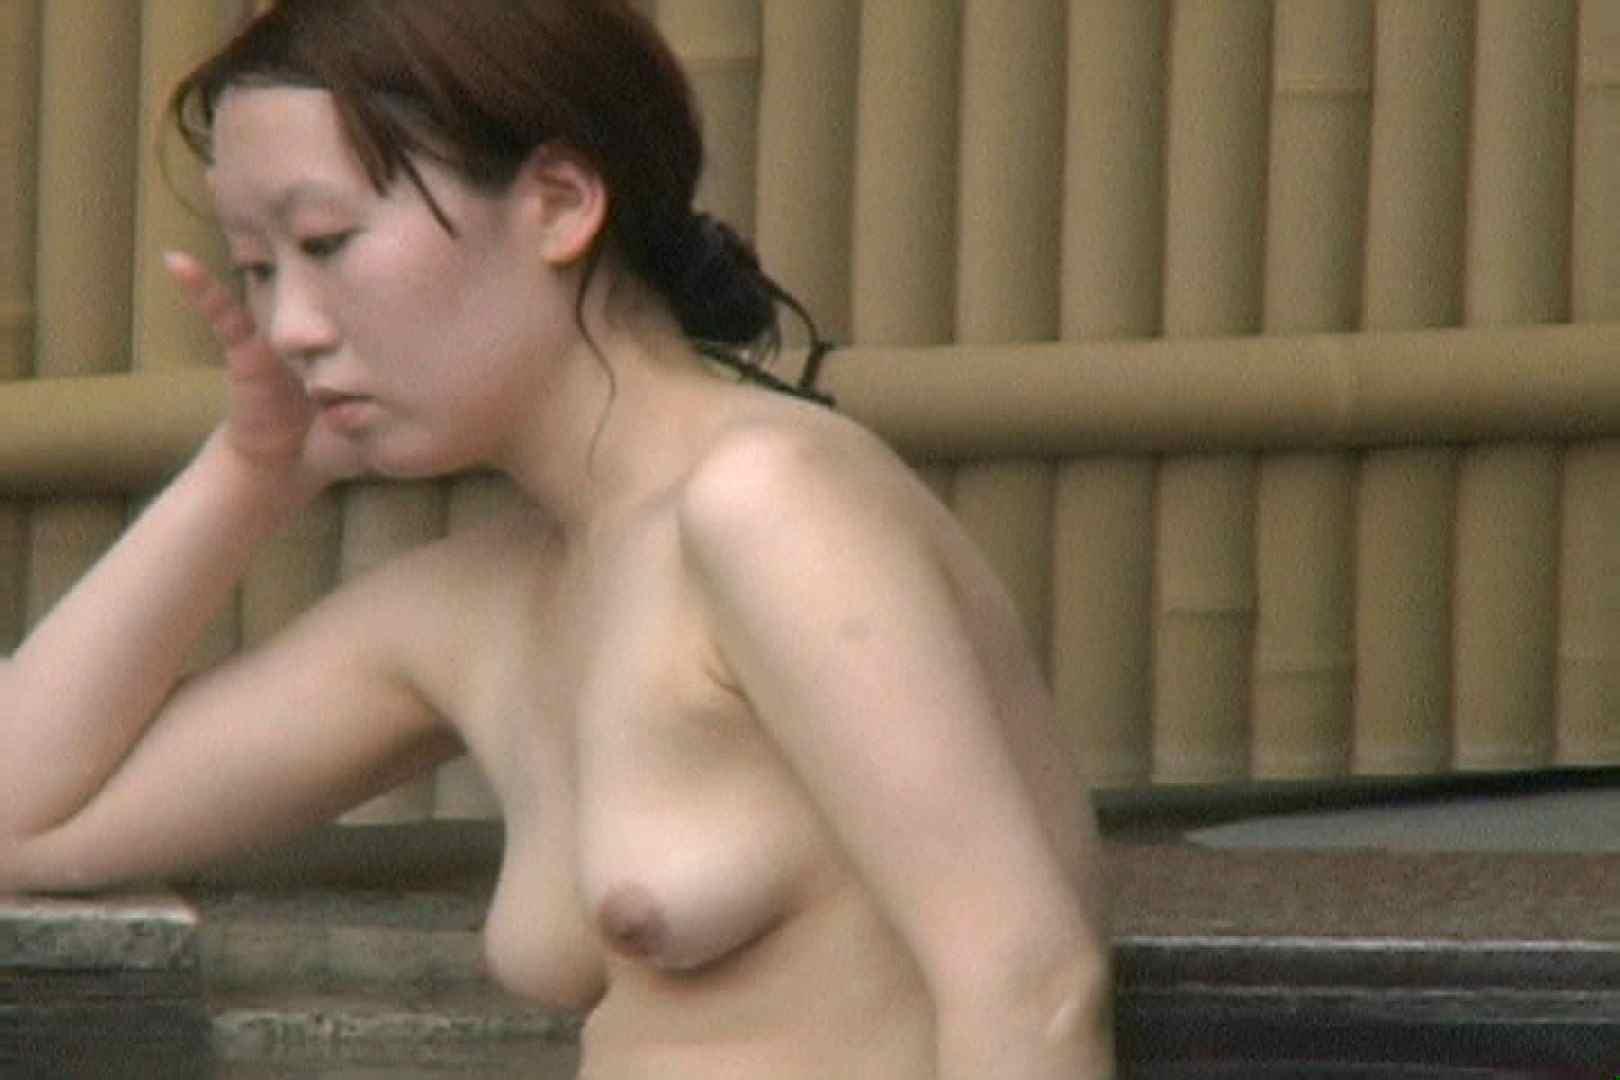 Aquaな露天風呂Vol.10【VIP】 露天風呂突入 われめAV動画紹介 93pic 68